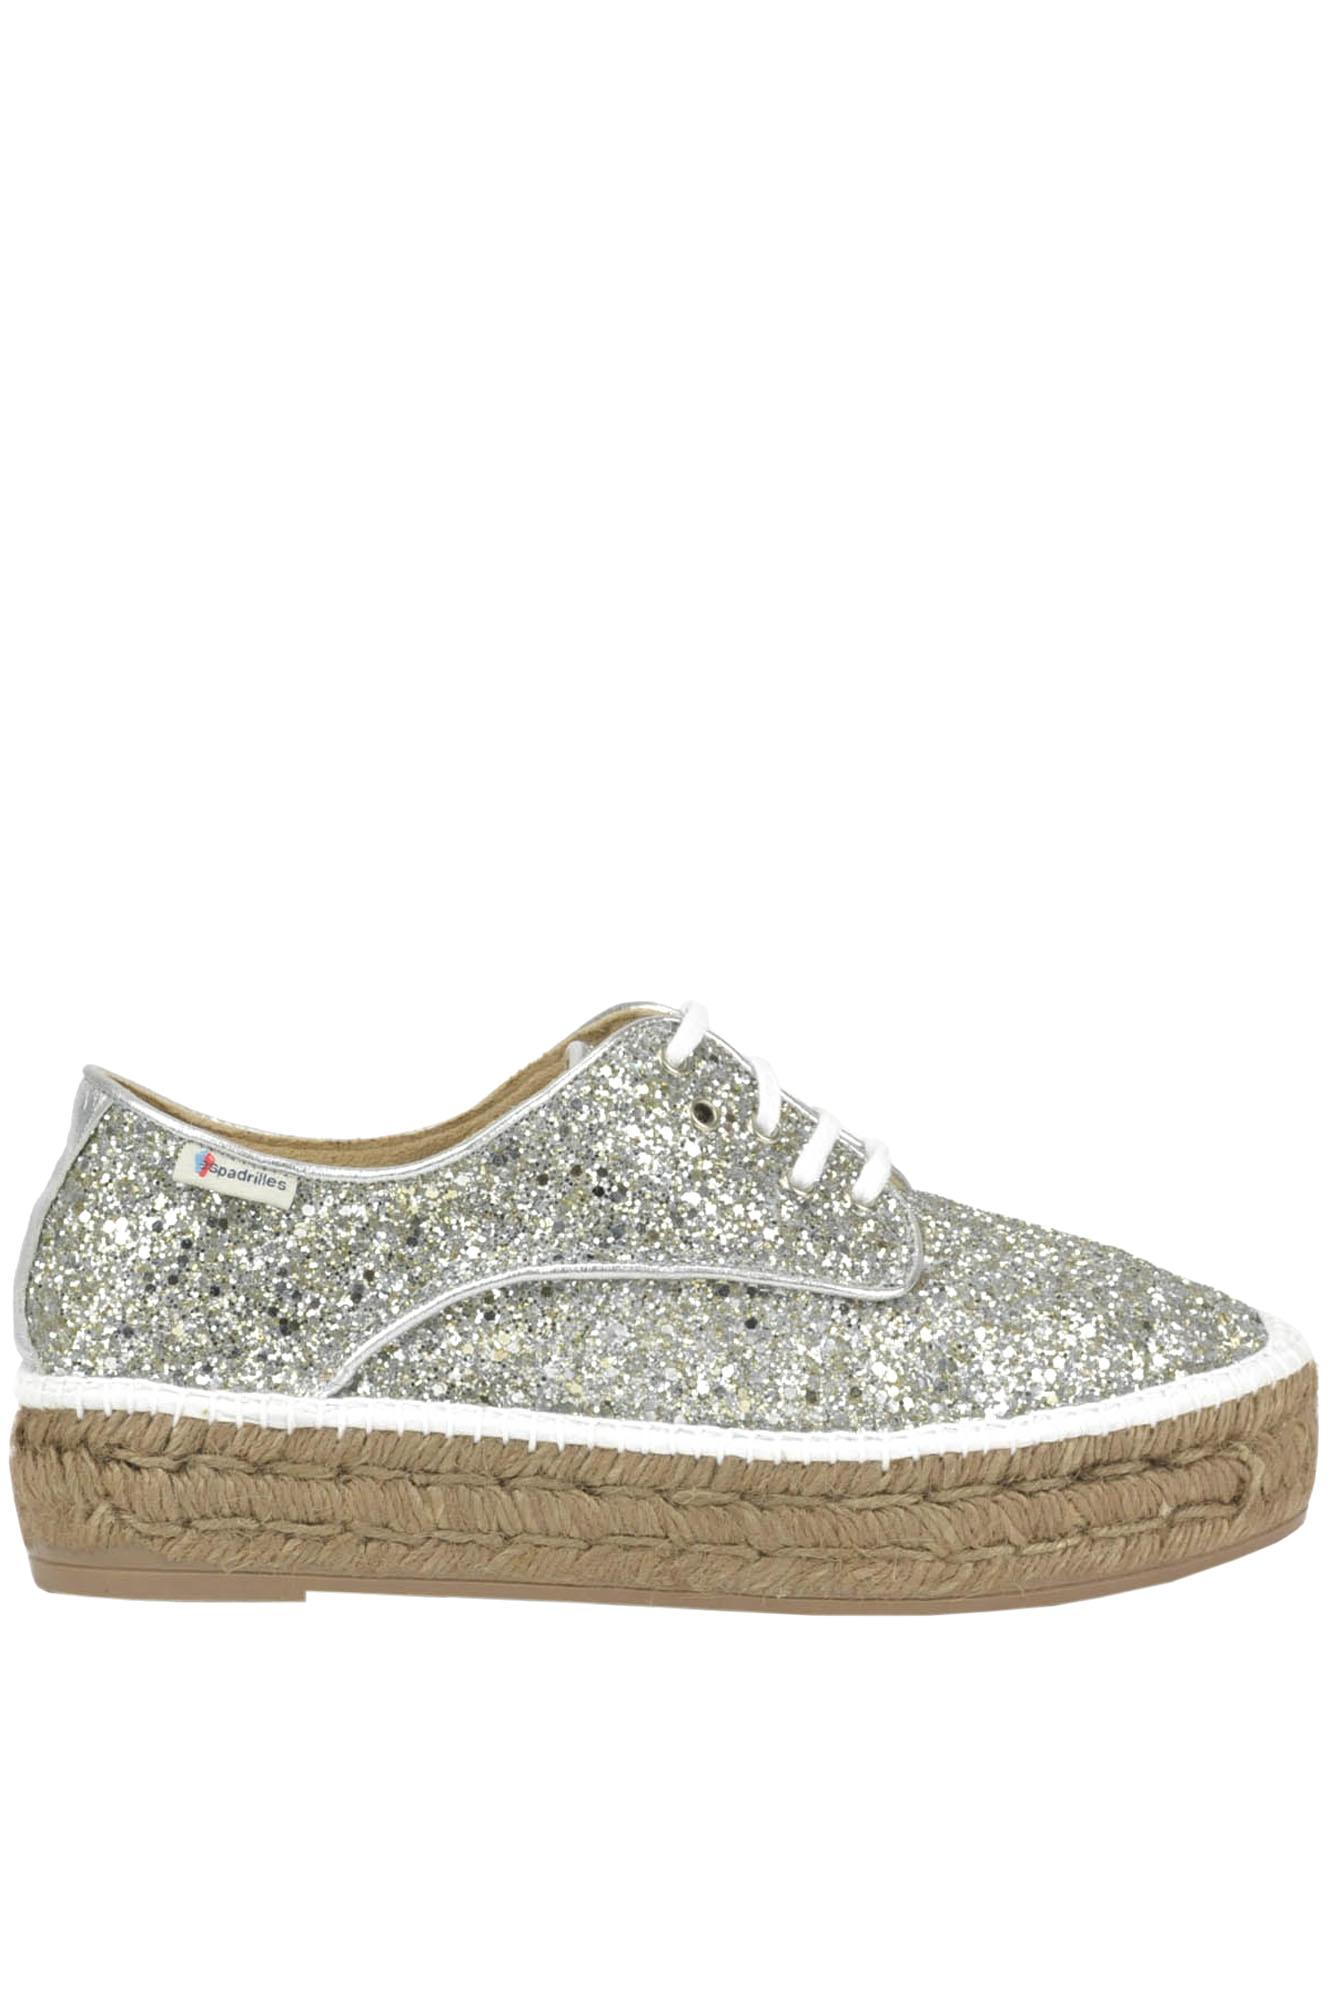 Image of Scarpe stringate glitterate